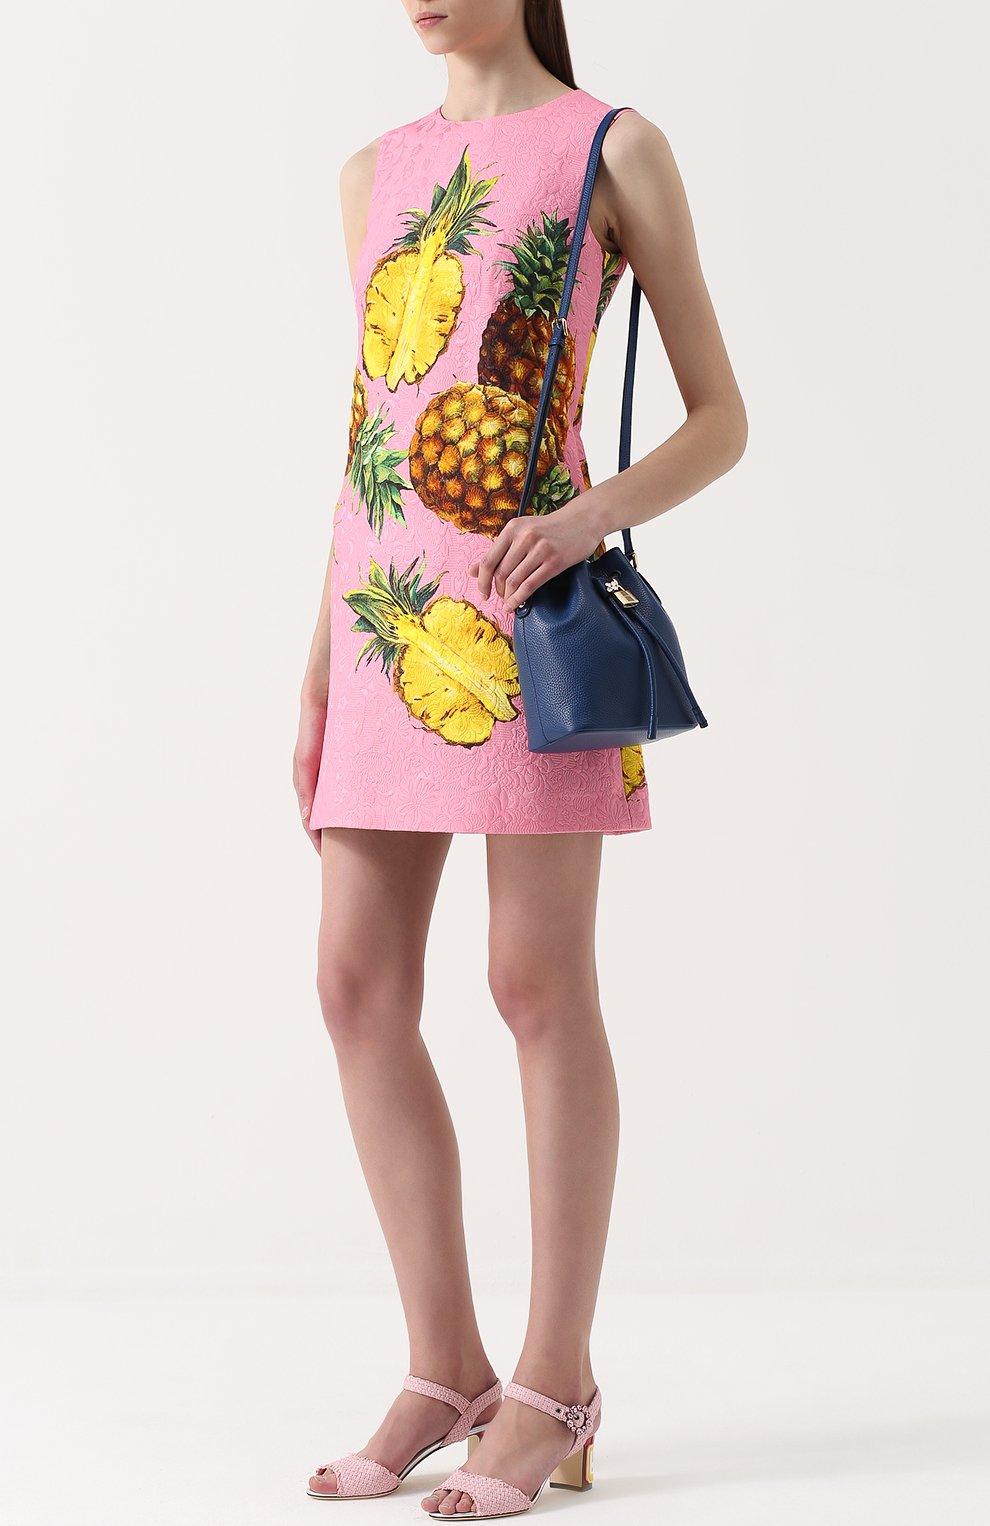 Плетеные босоножки Keira на каблуке с декором | Фото №2